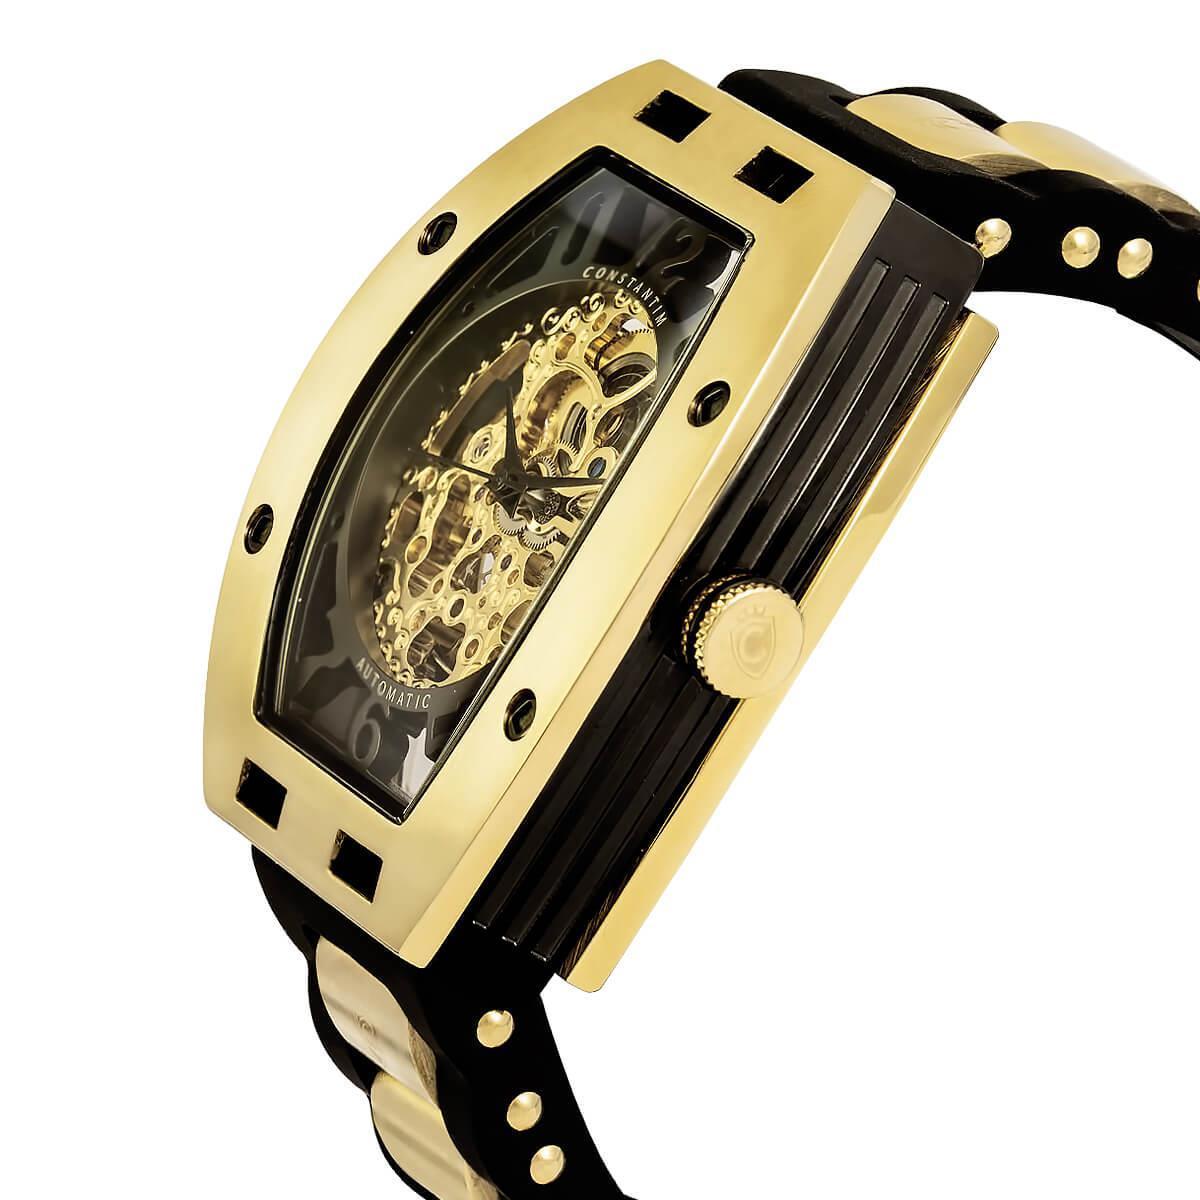 04e48228092 Relógio Masculino Constantim Full Skeleton ZW30303U - Relógio ...